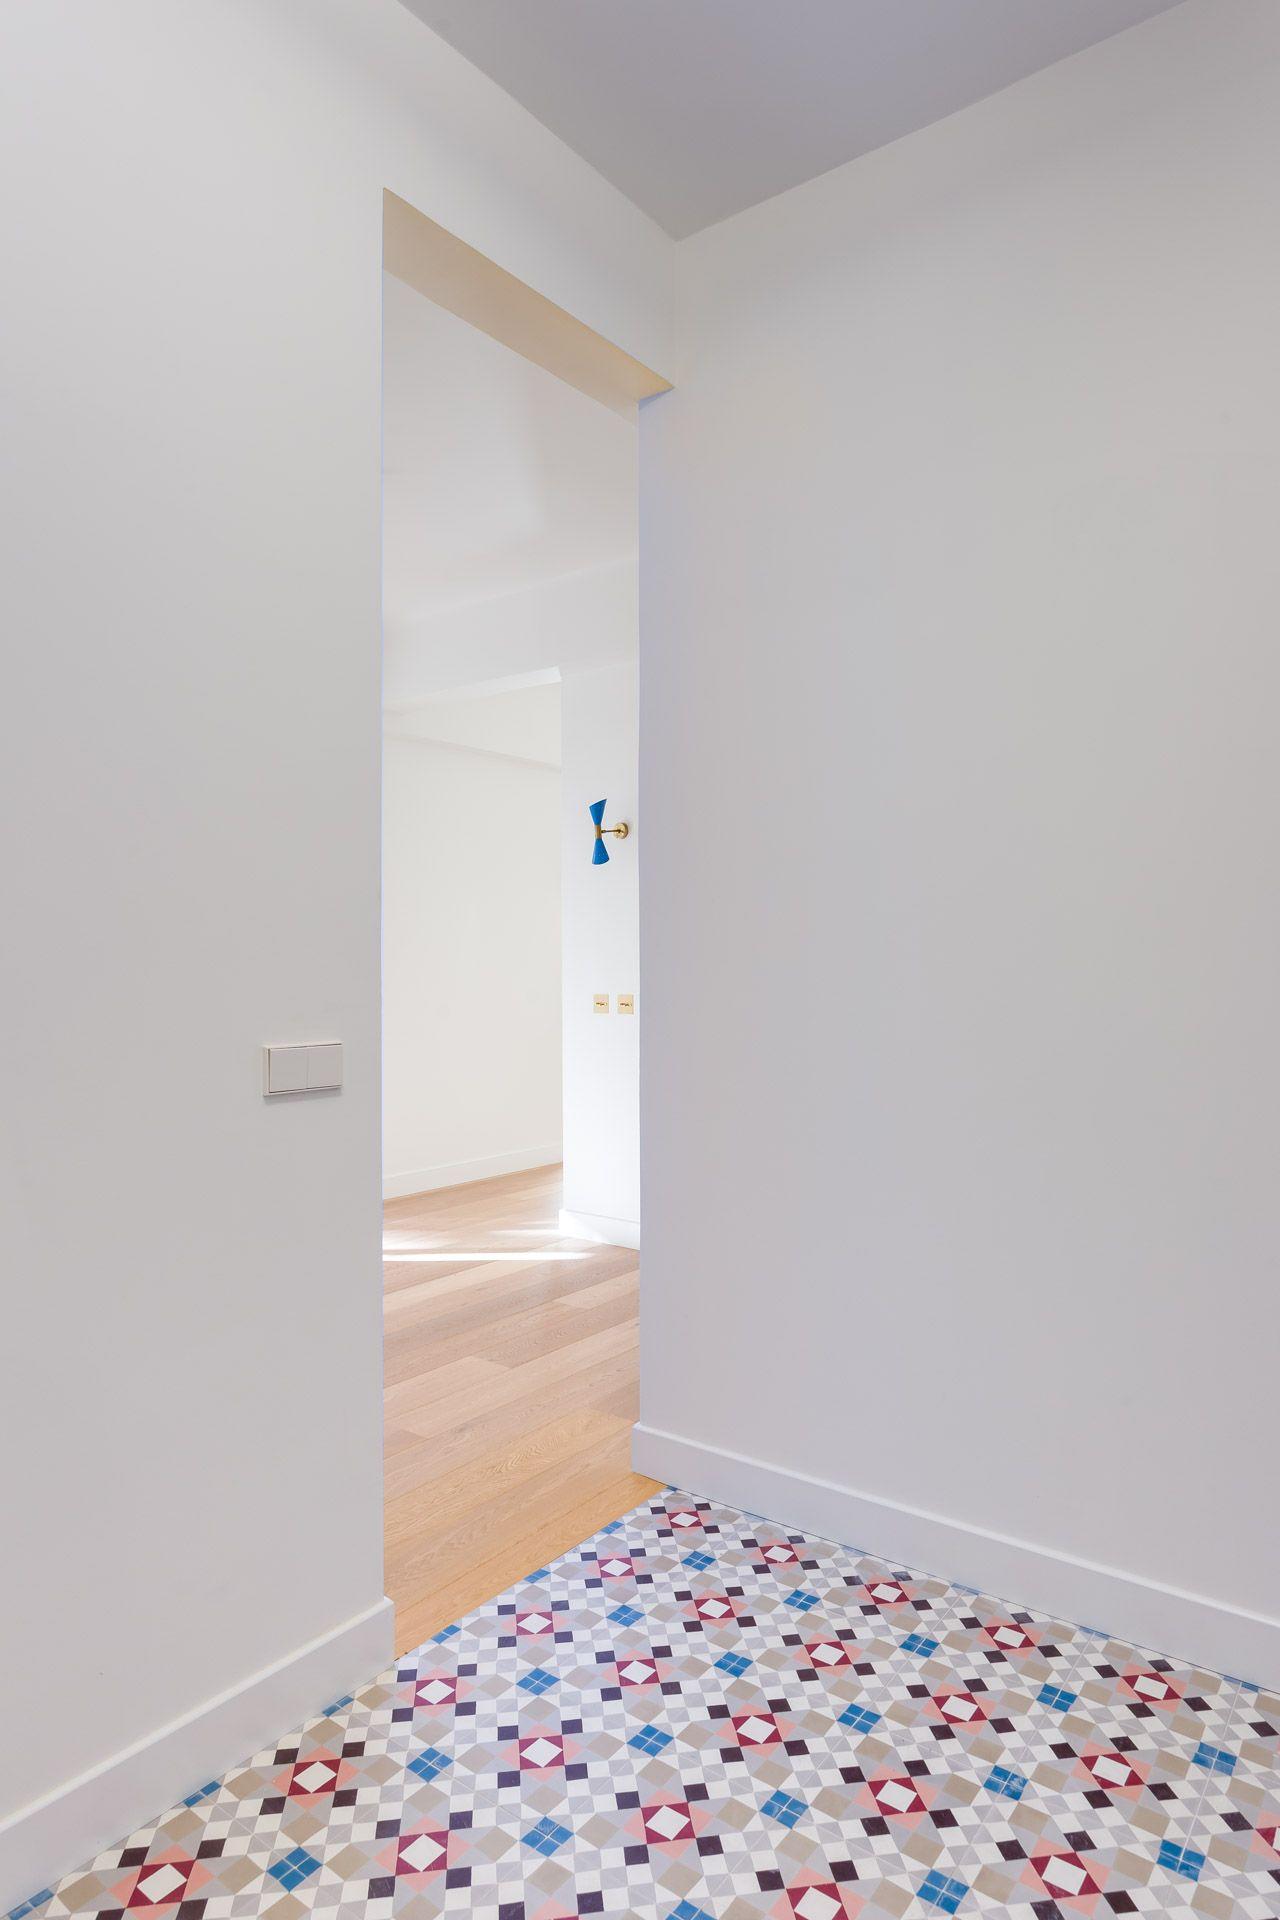 Abracadabra Decor Vigo Home Staging Compostela reforma integral de vivienda - decoración